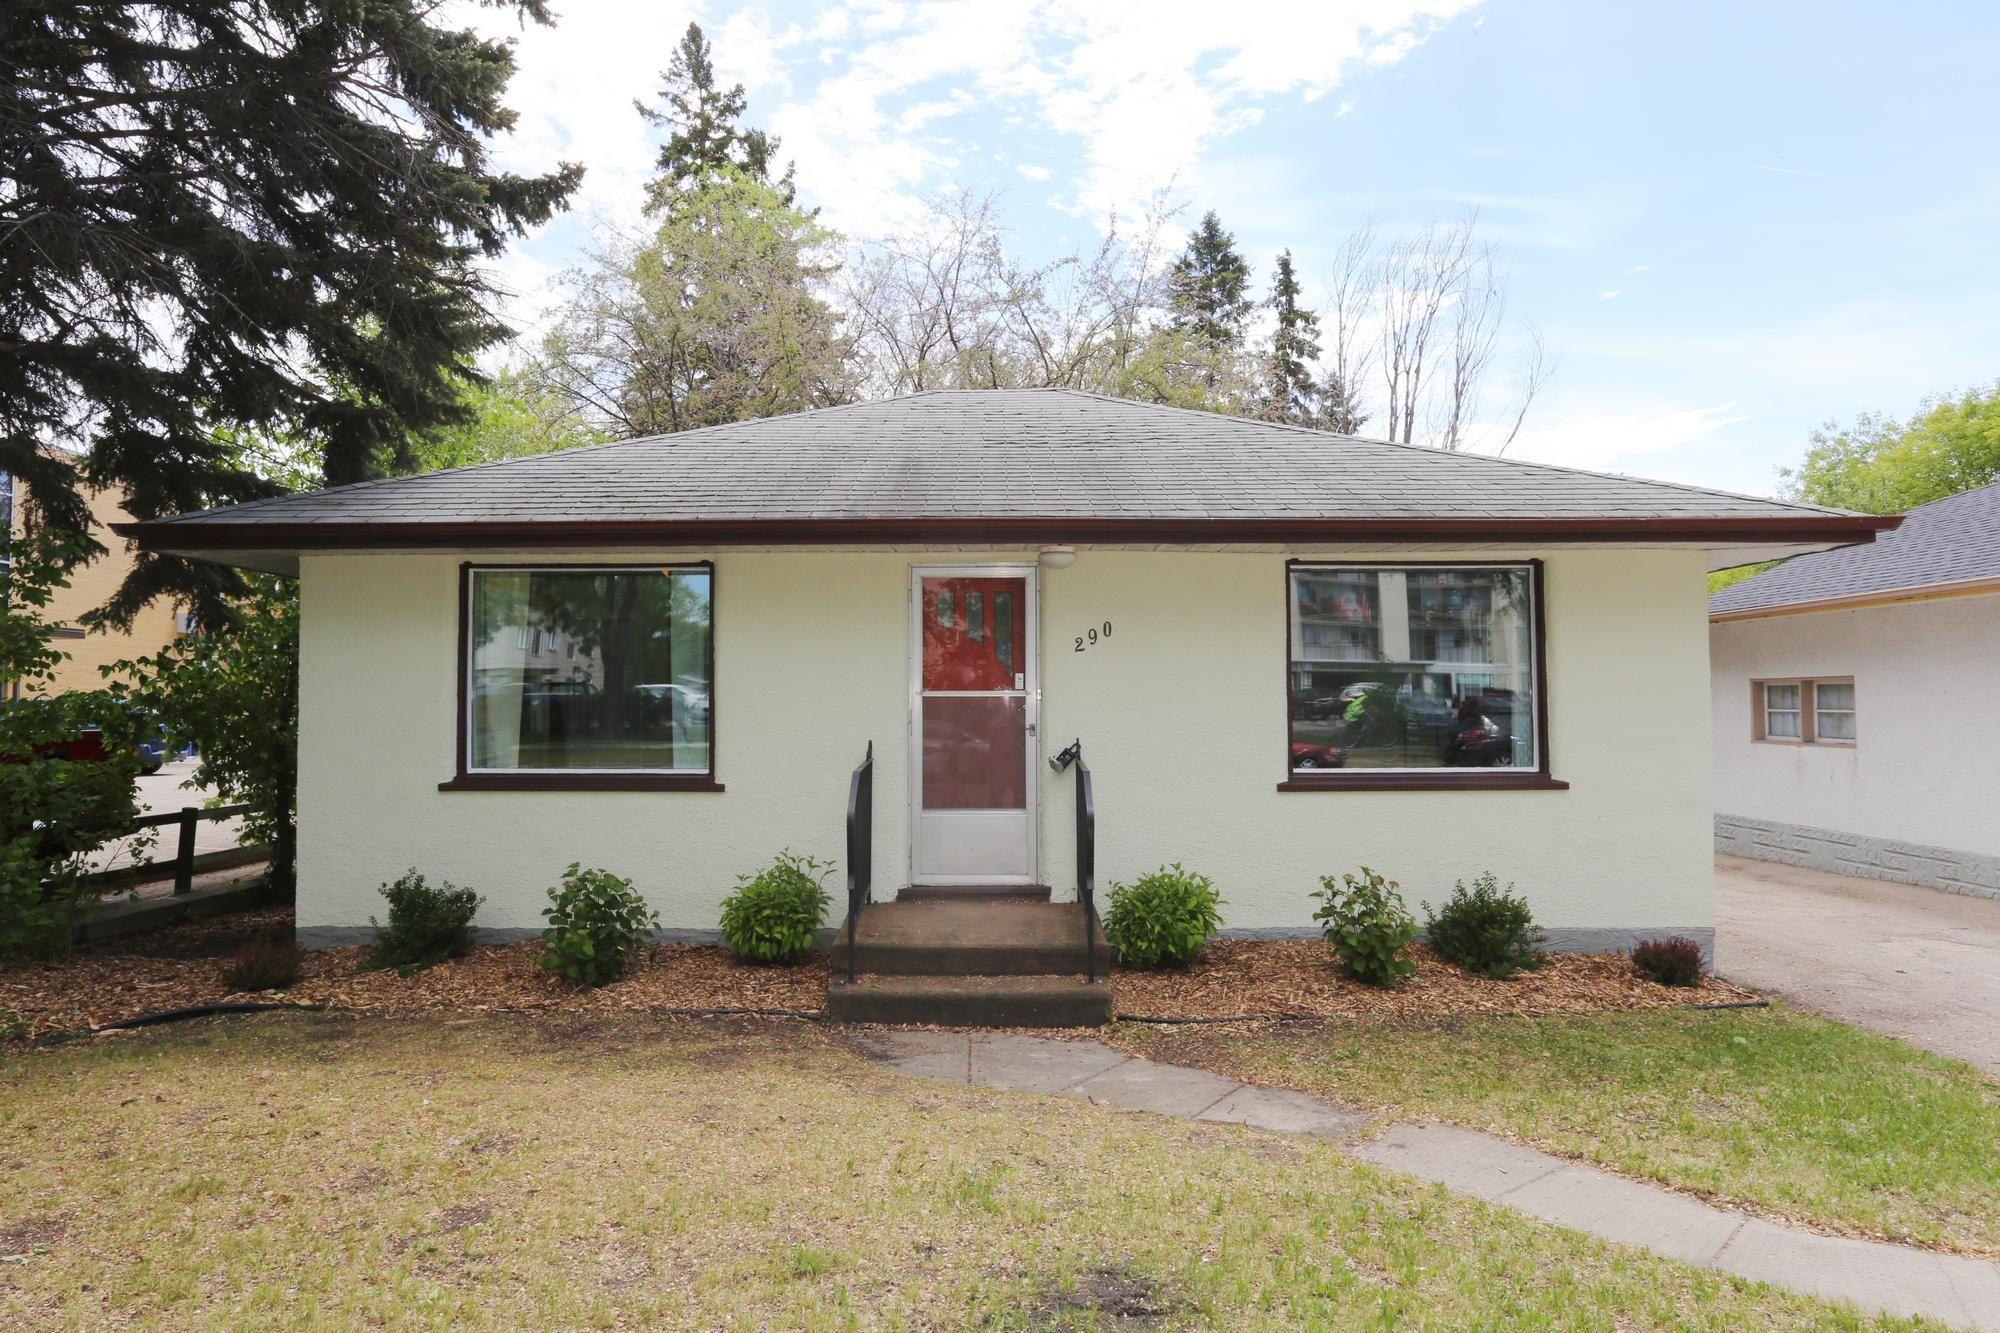 Photo 2: Photos: 290 McLeod Avenue in Winnipeg: North Kildonan Single Family Detached for sale (3F)  : MLS®# 1814938